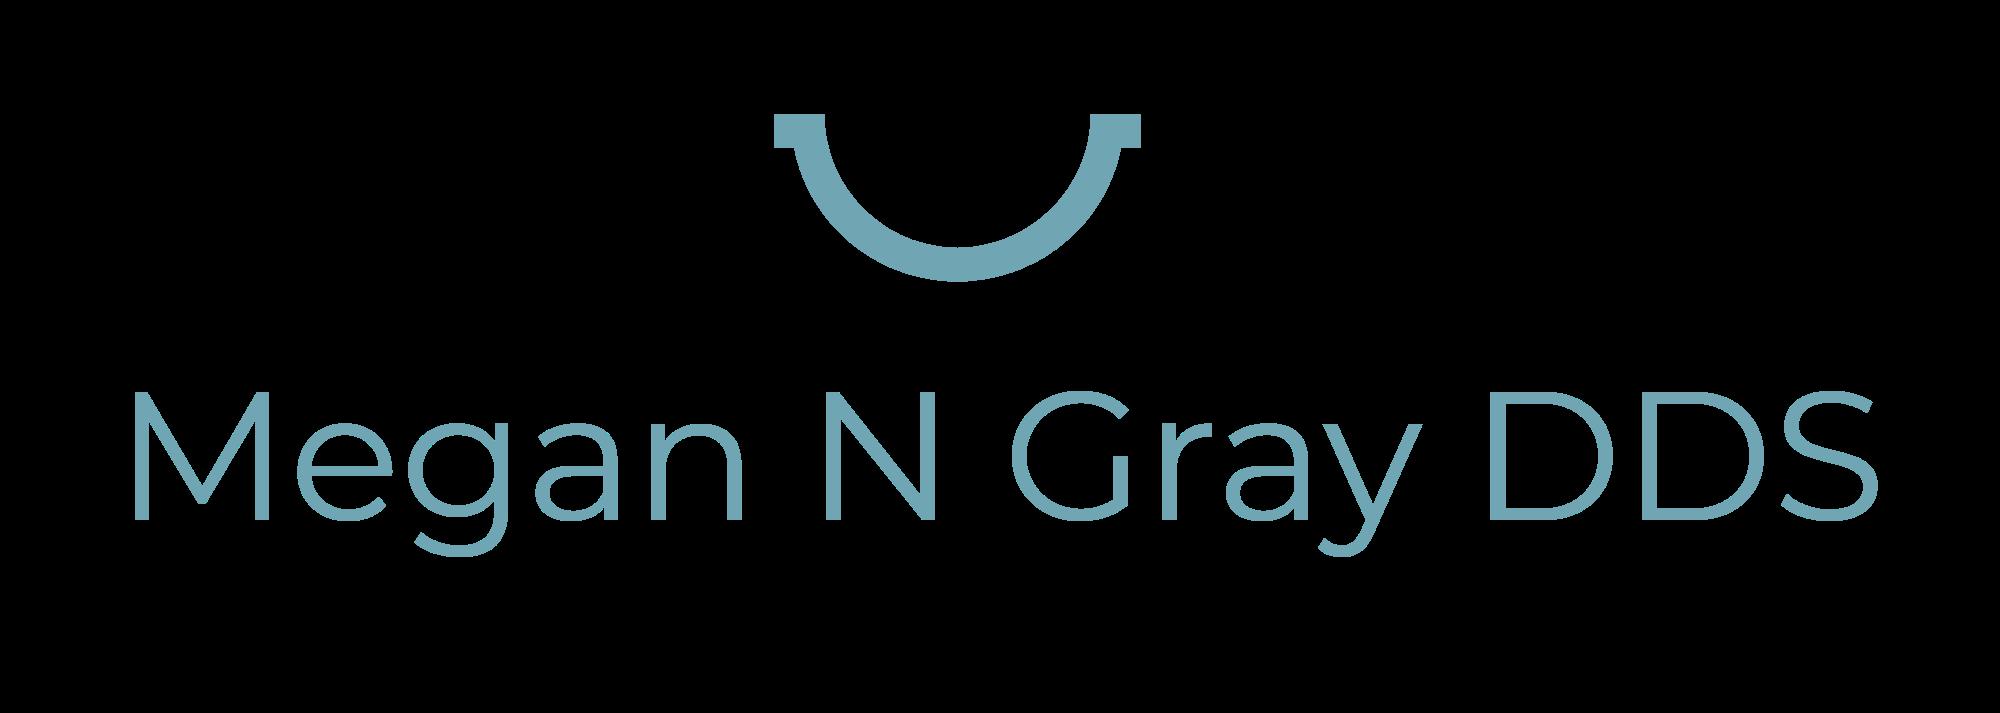 Megan N Gray DDS -logo (1).png